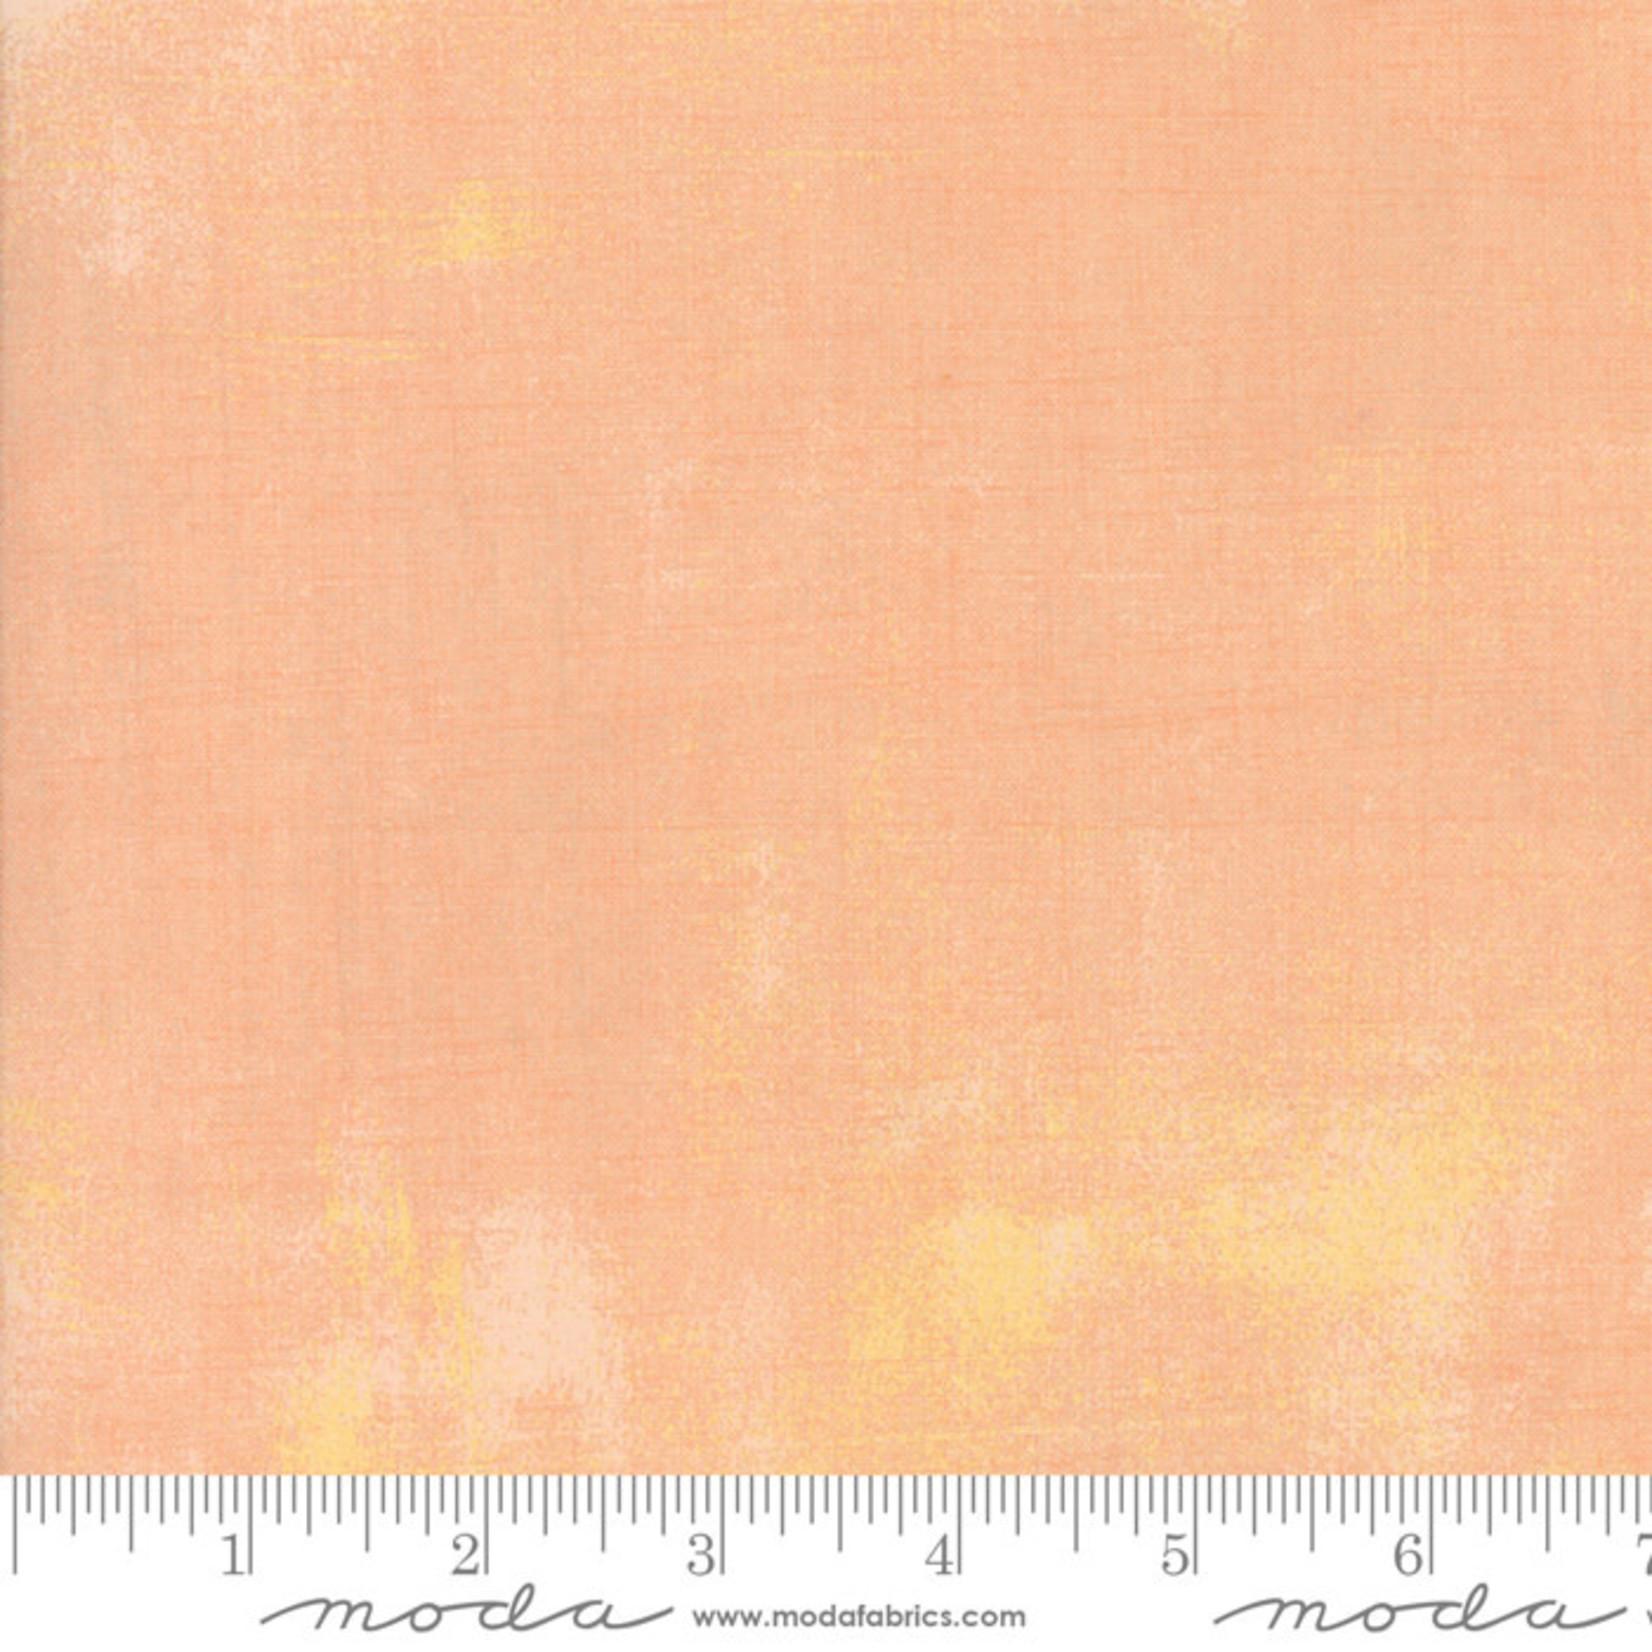 Moda Grunge Basics Grunge - Peach Nectar per cm or $20/m